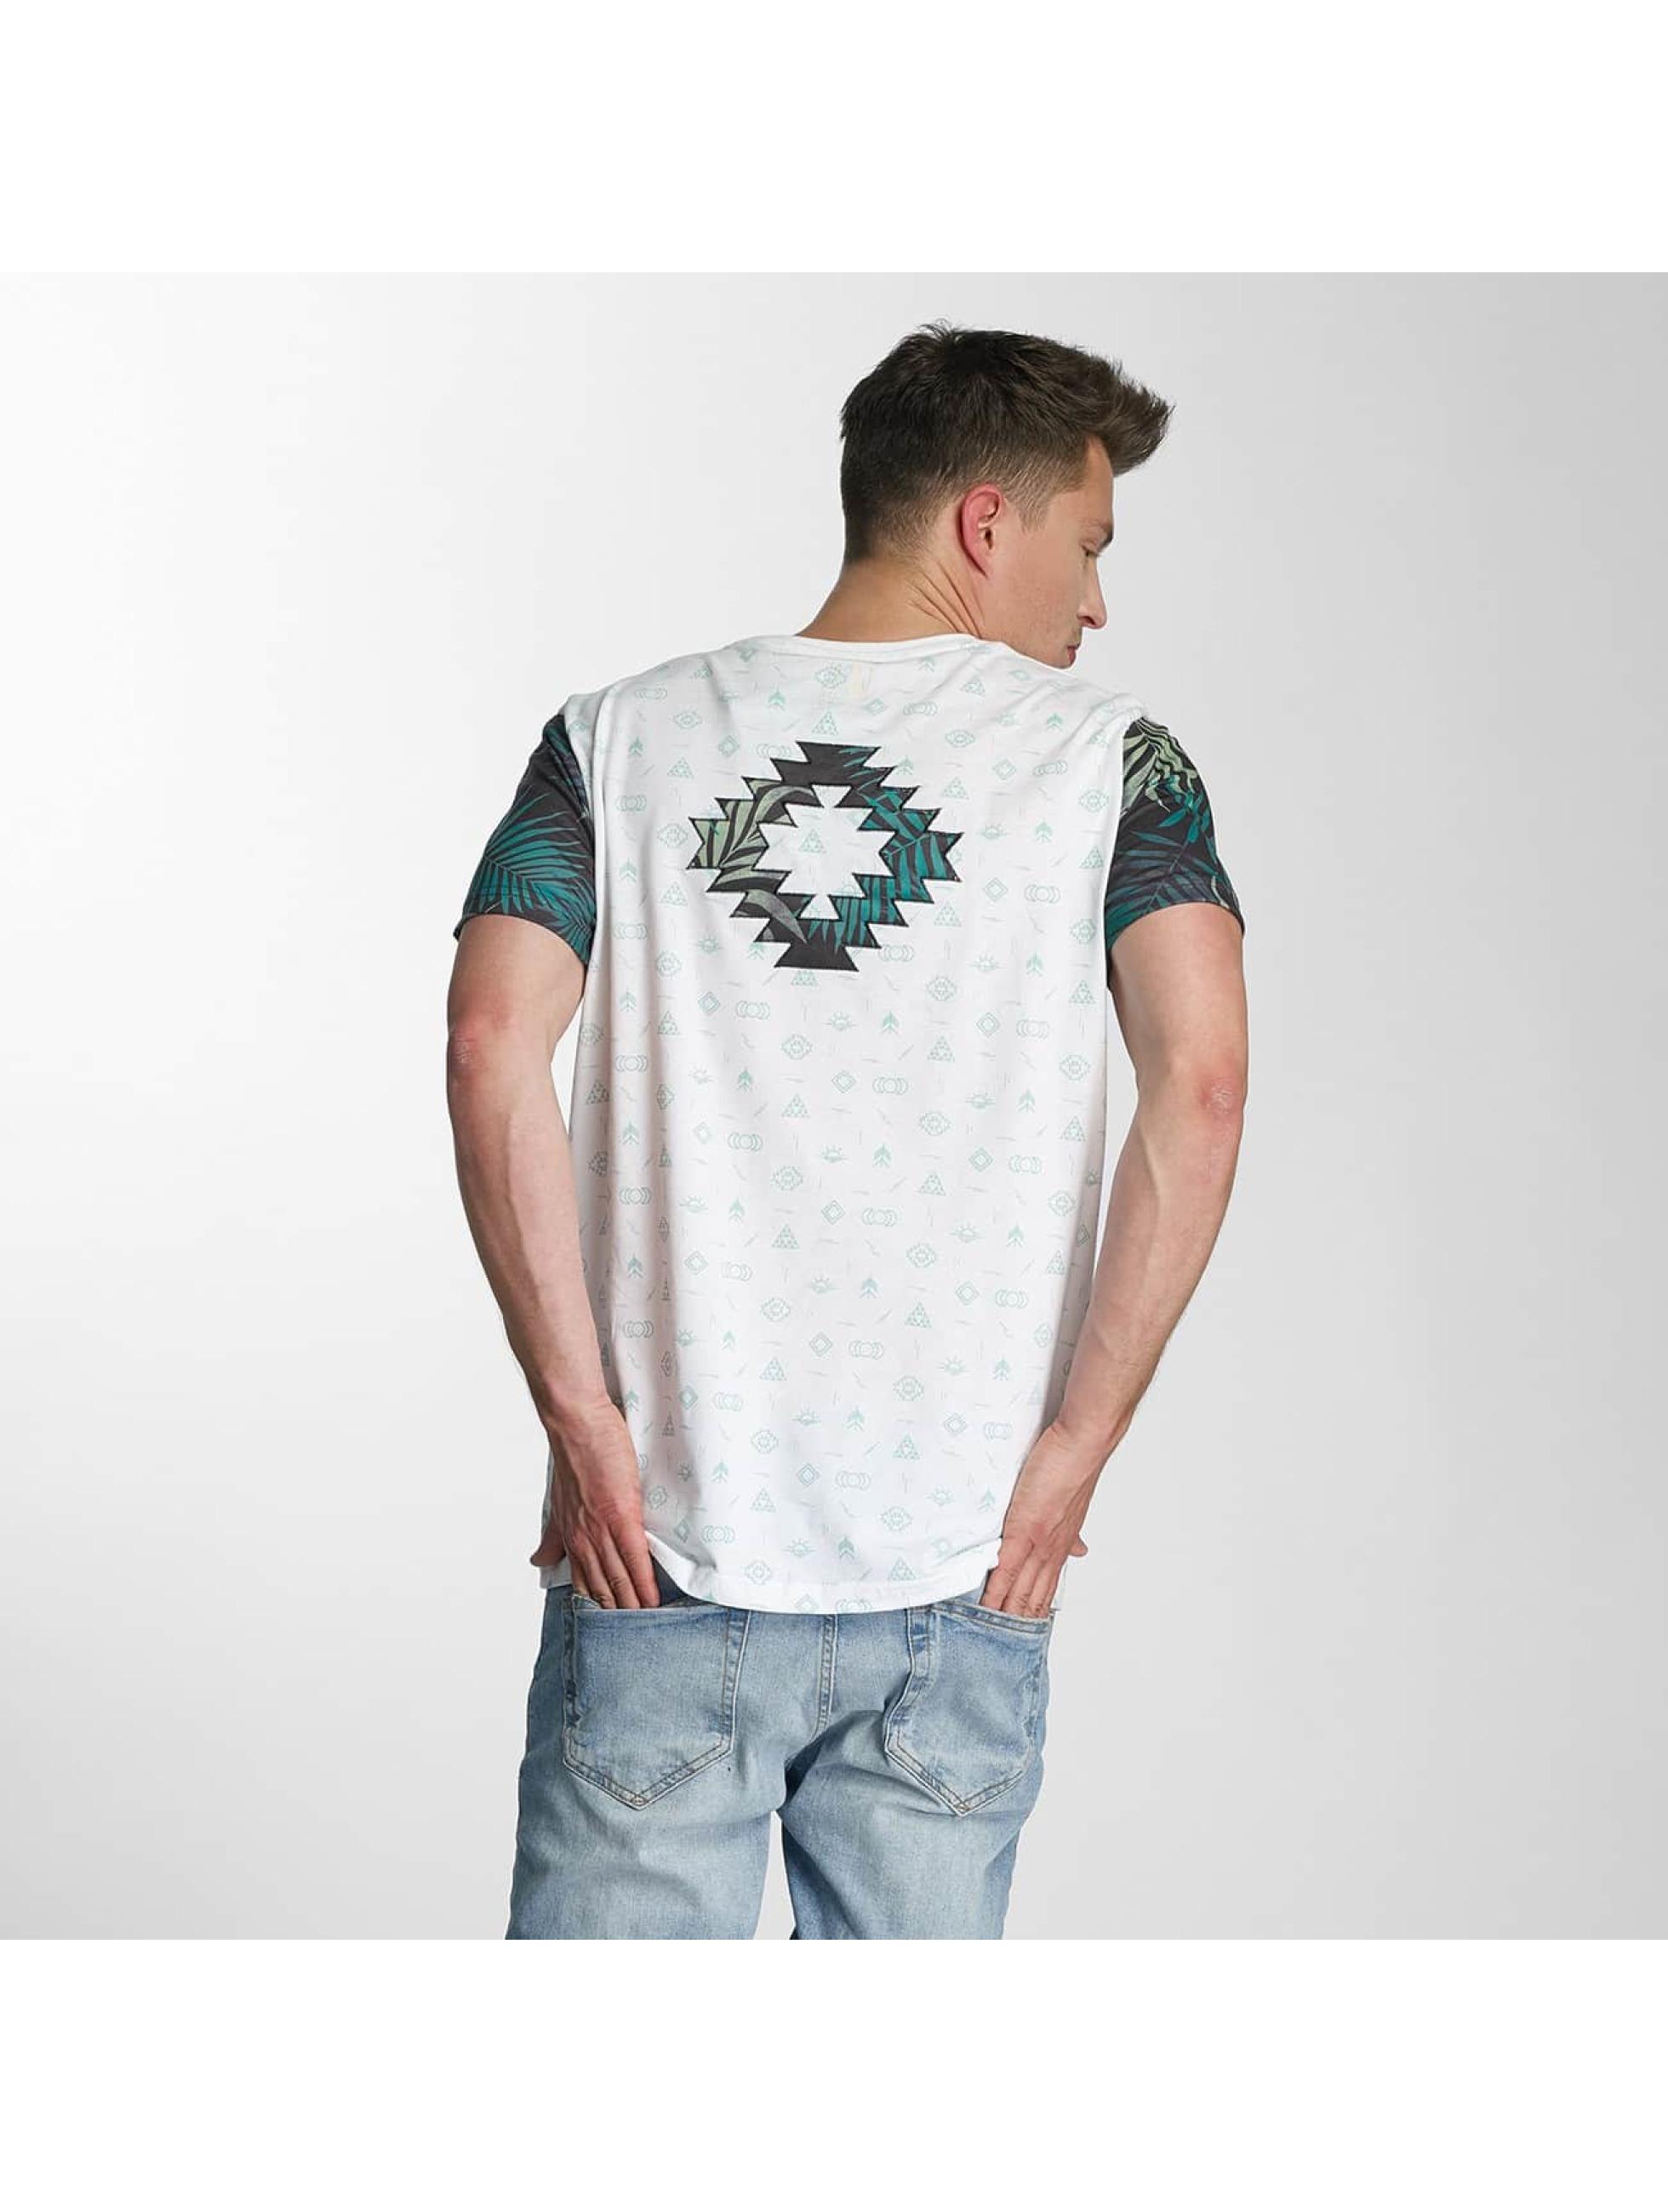 Just Rhyse / T-Shirt Lake Davi's in white S